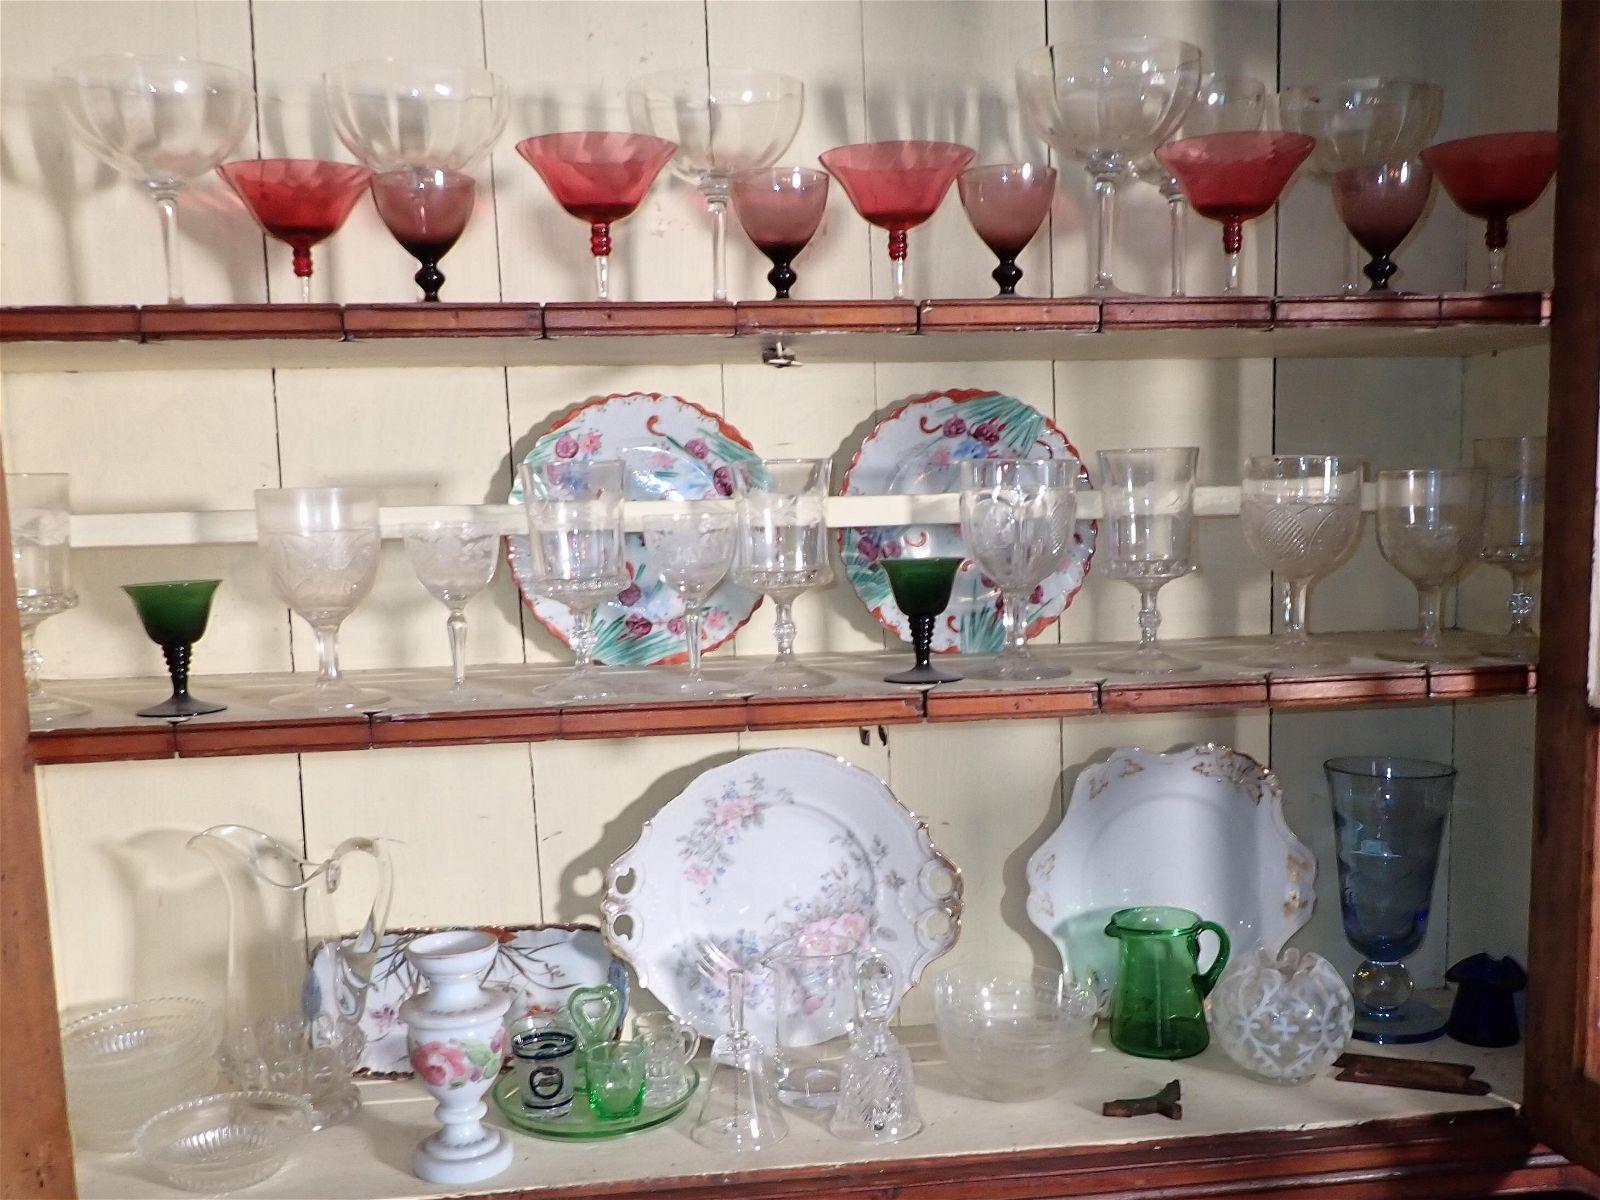 Glassware Crystal Porcelain Cupboard Contents